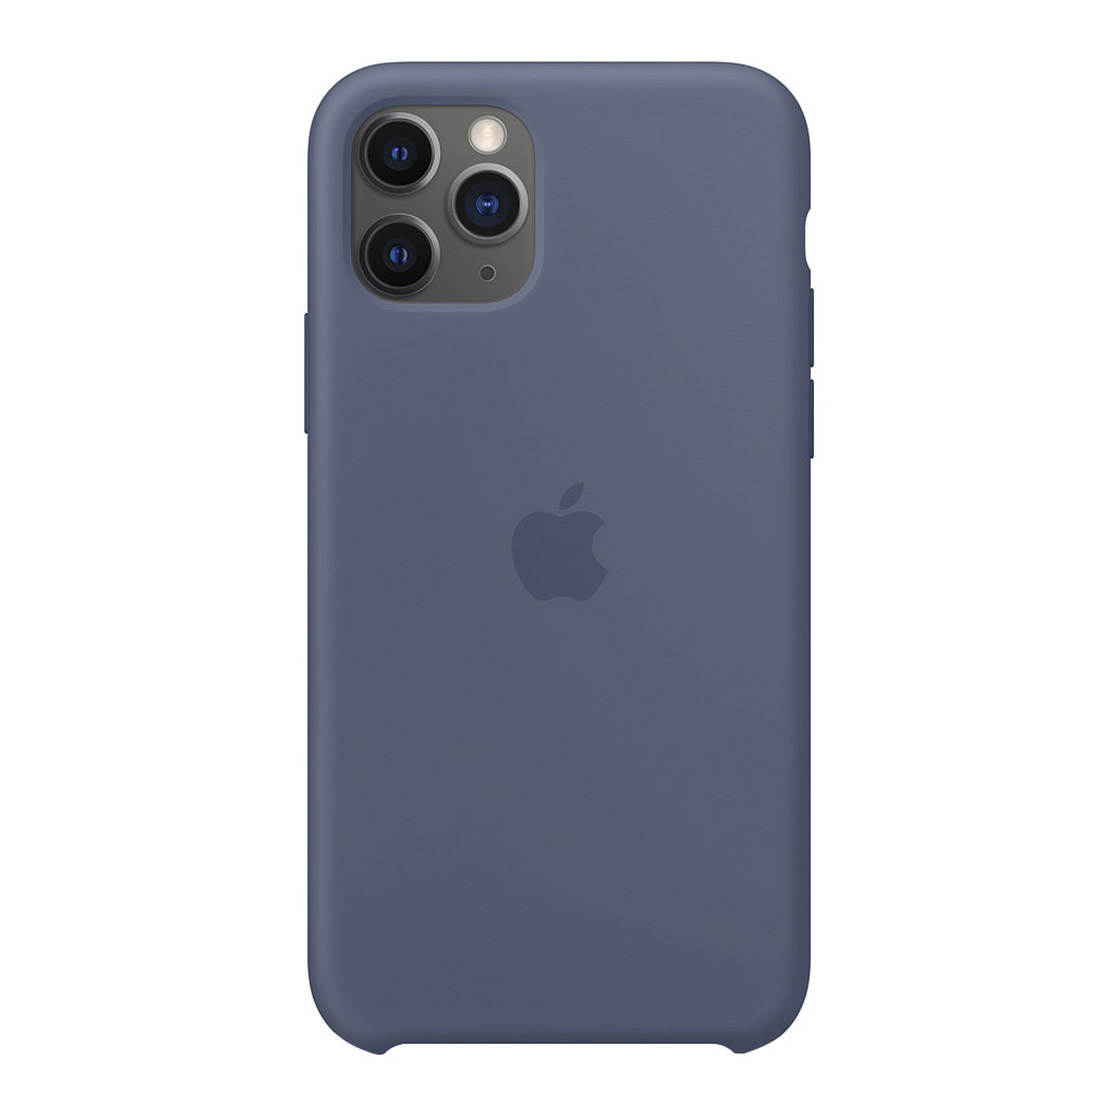 Чехол для смартфона Apple iPhone 11 Pro Silicone Case, темно-синий